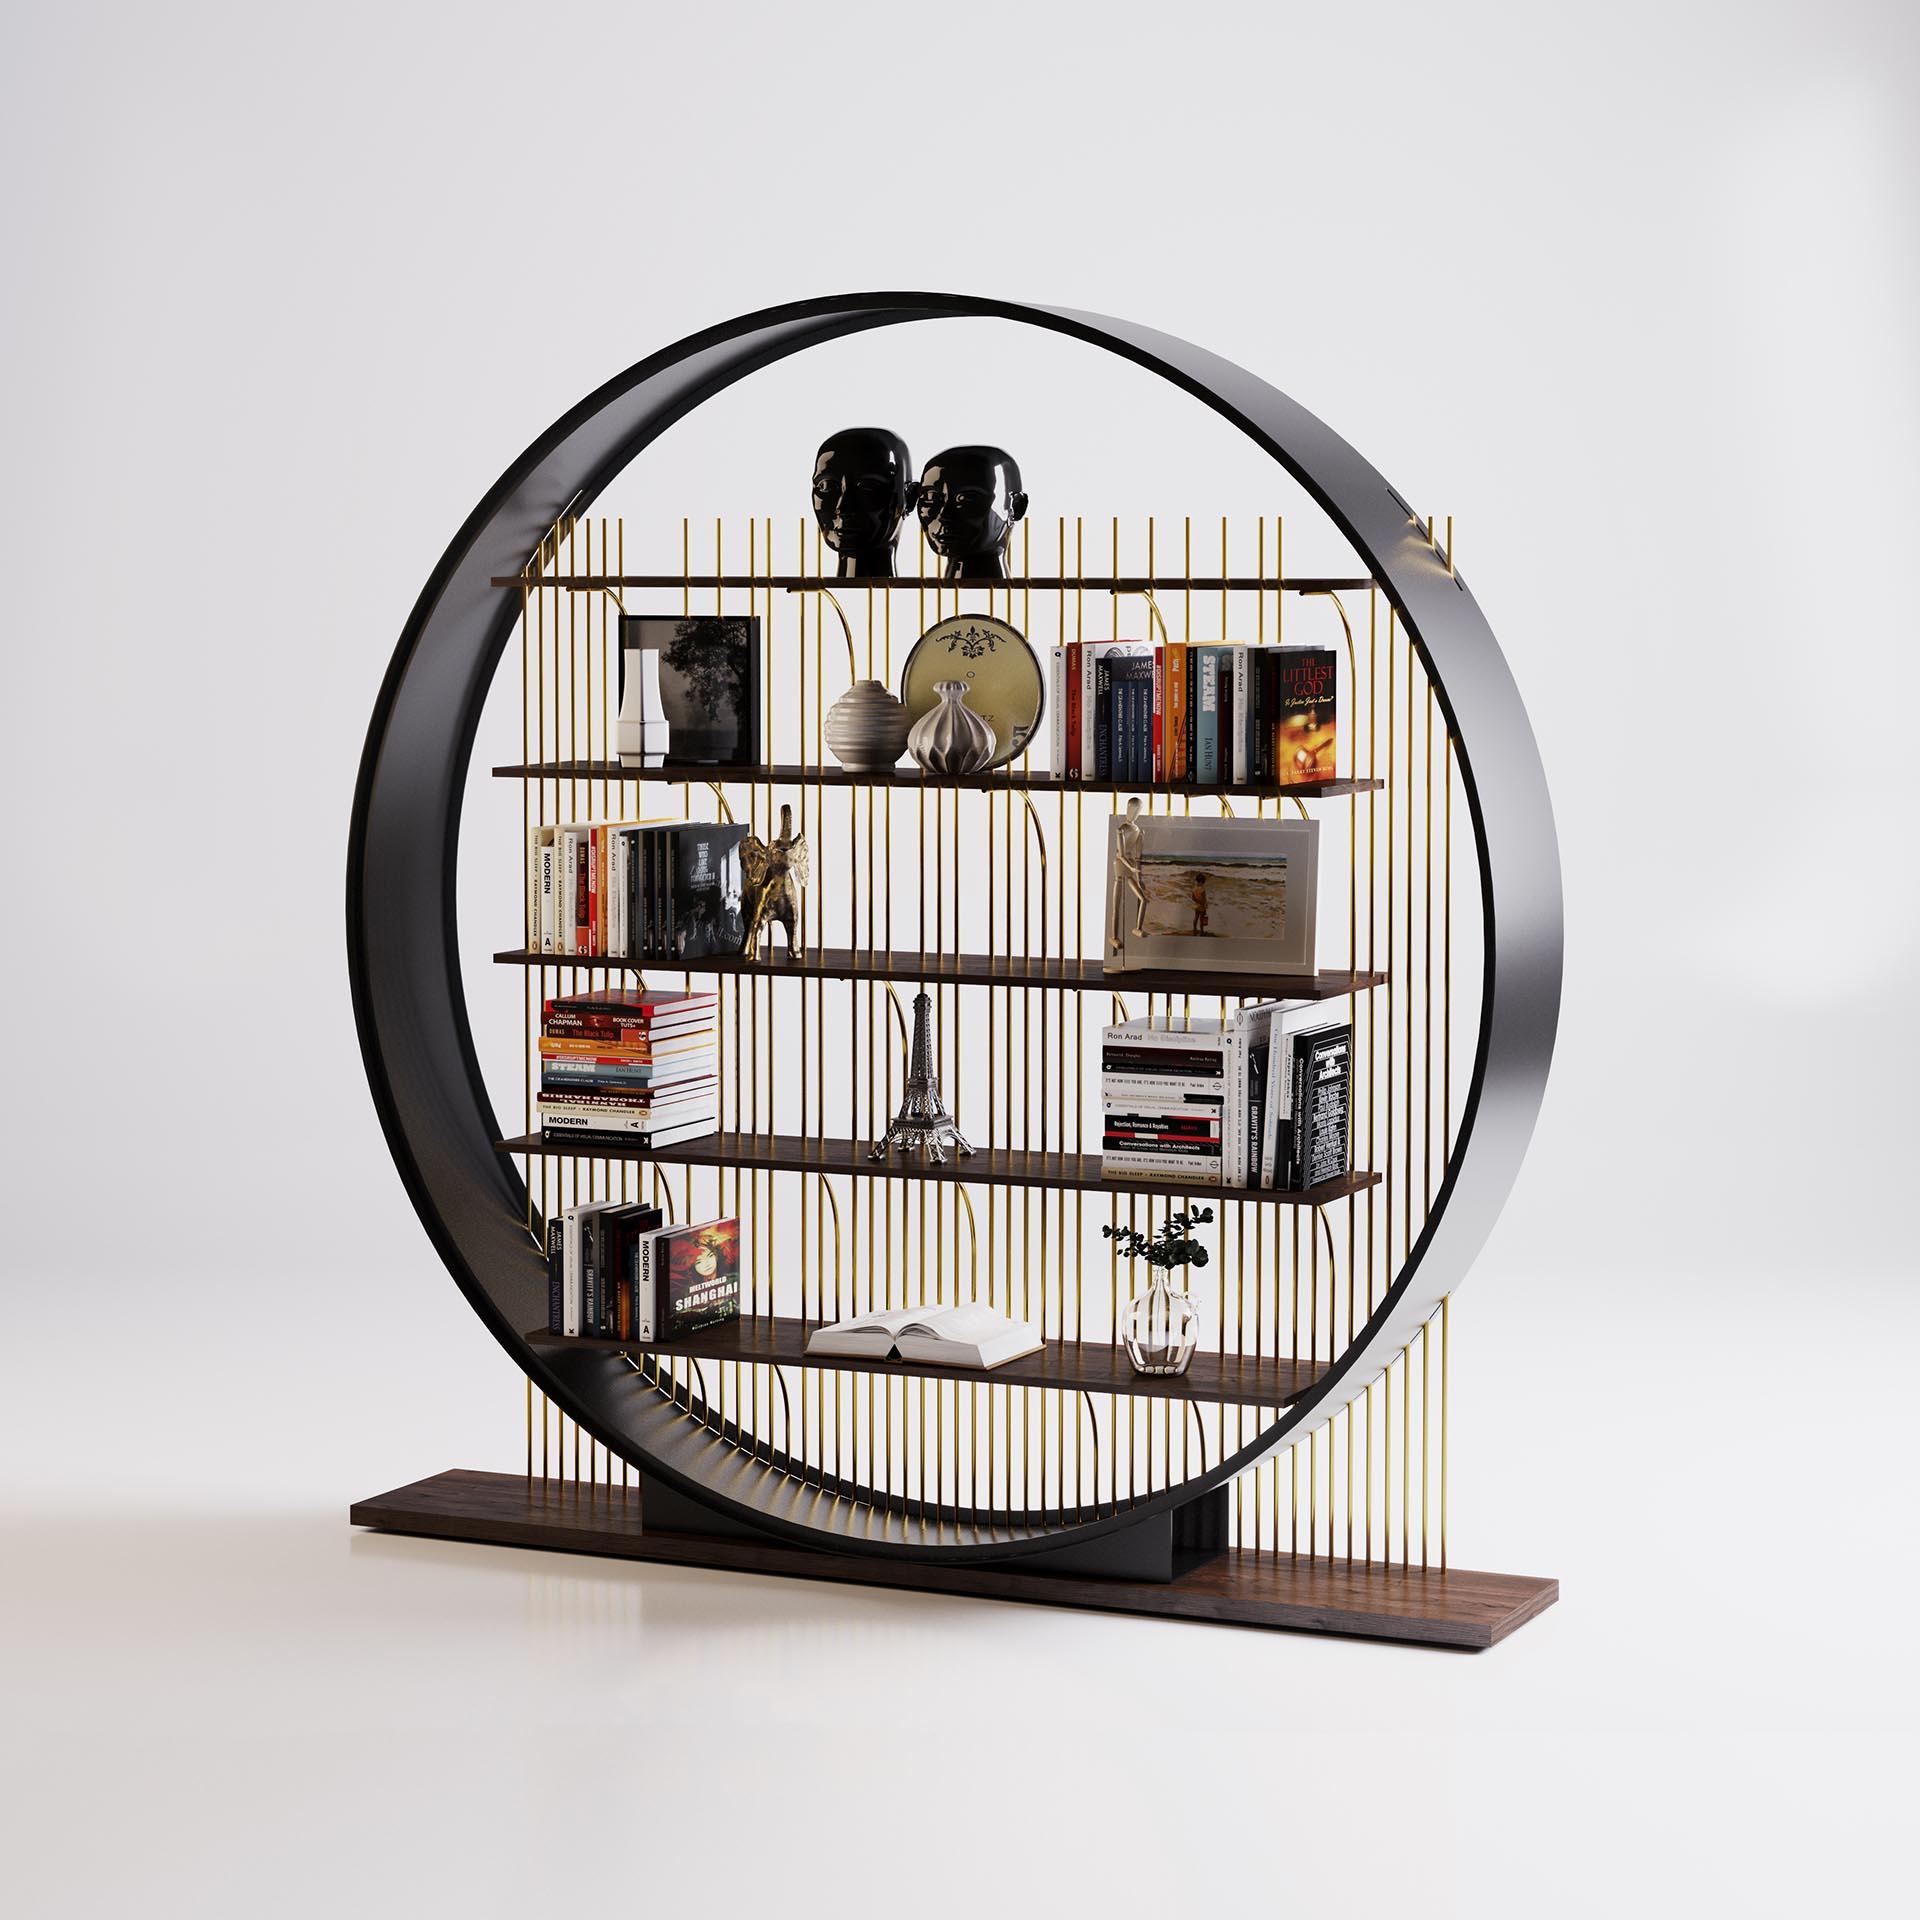 The ring bookshelf with a circular design